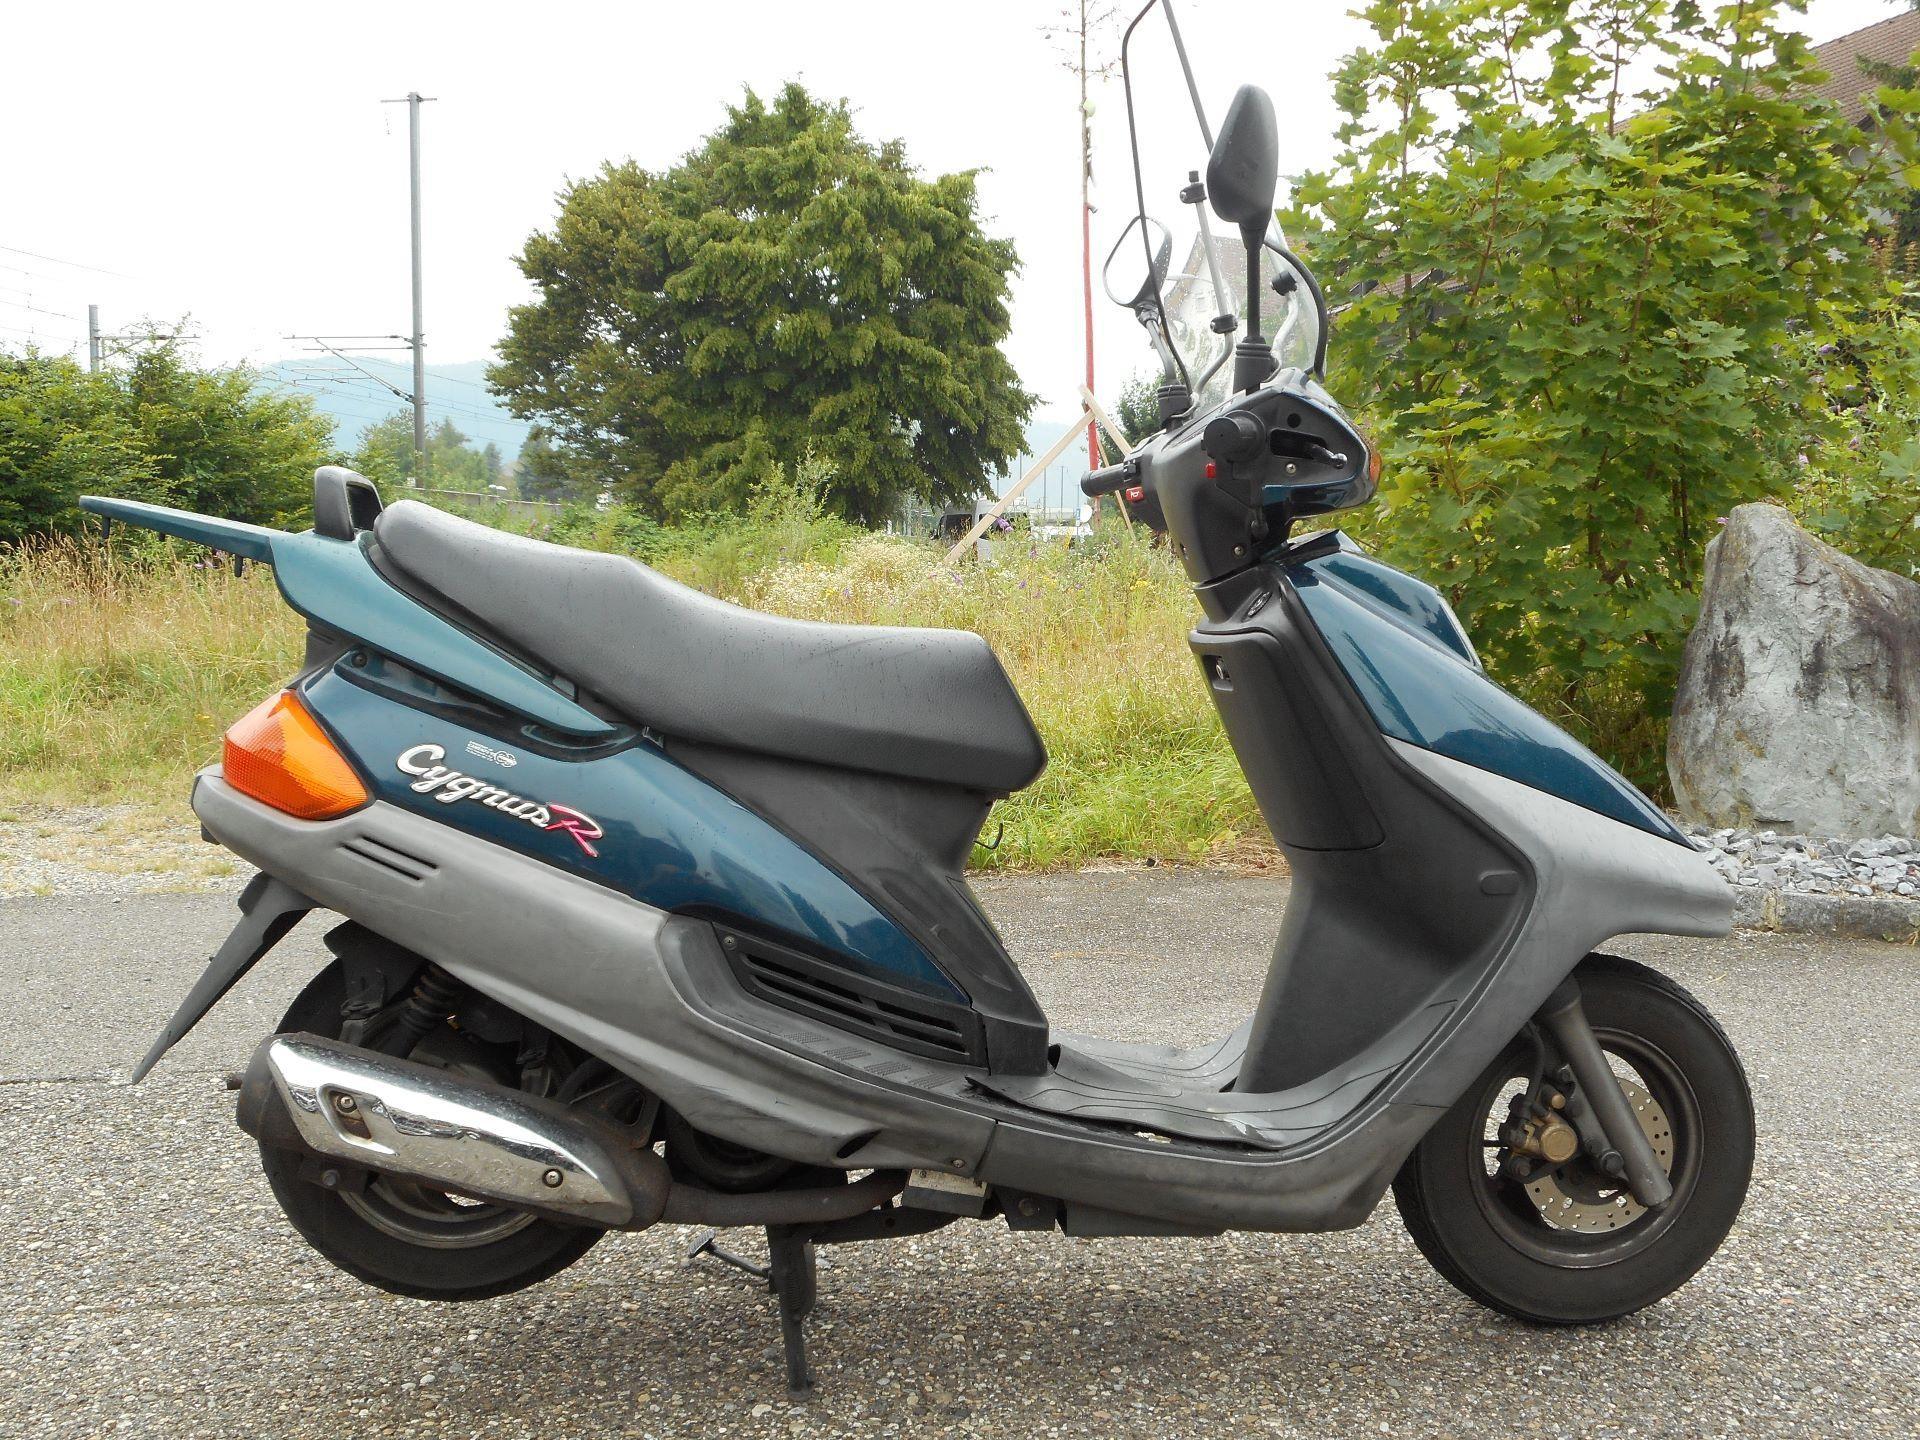 Yamaha XC 125 TR Cygnus Photos, Informations, Articles